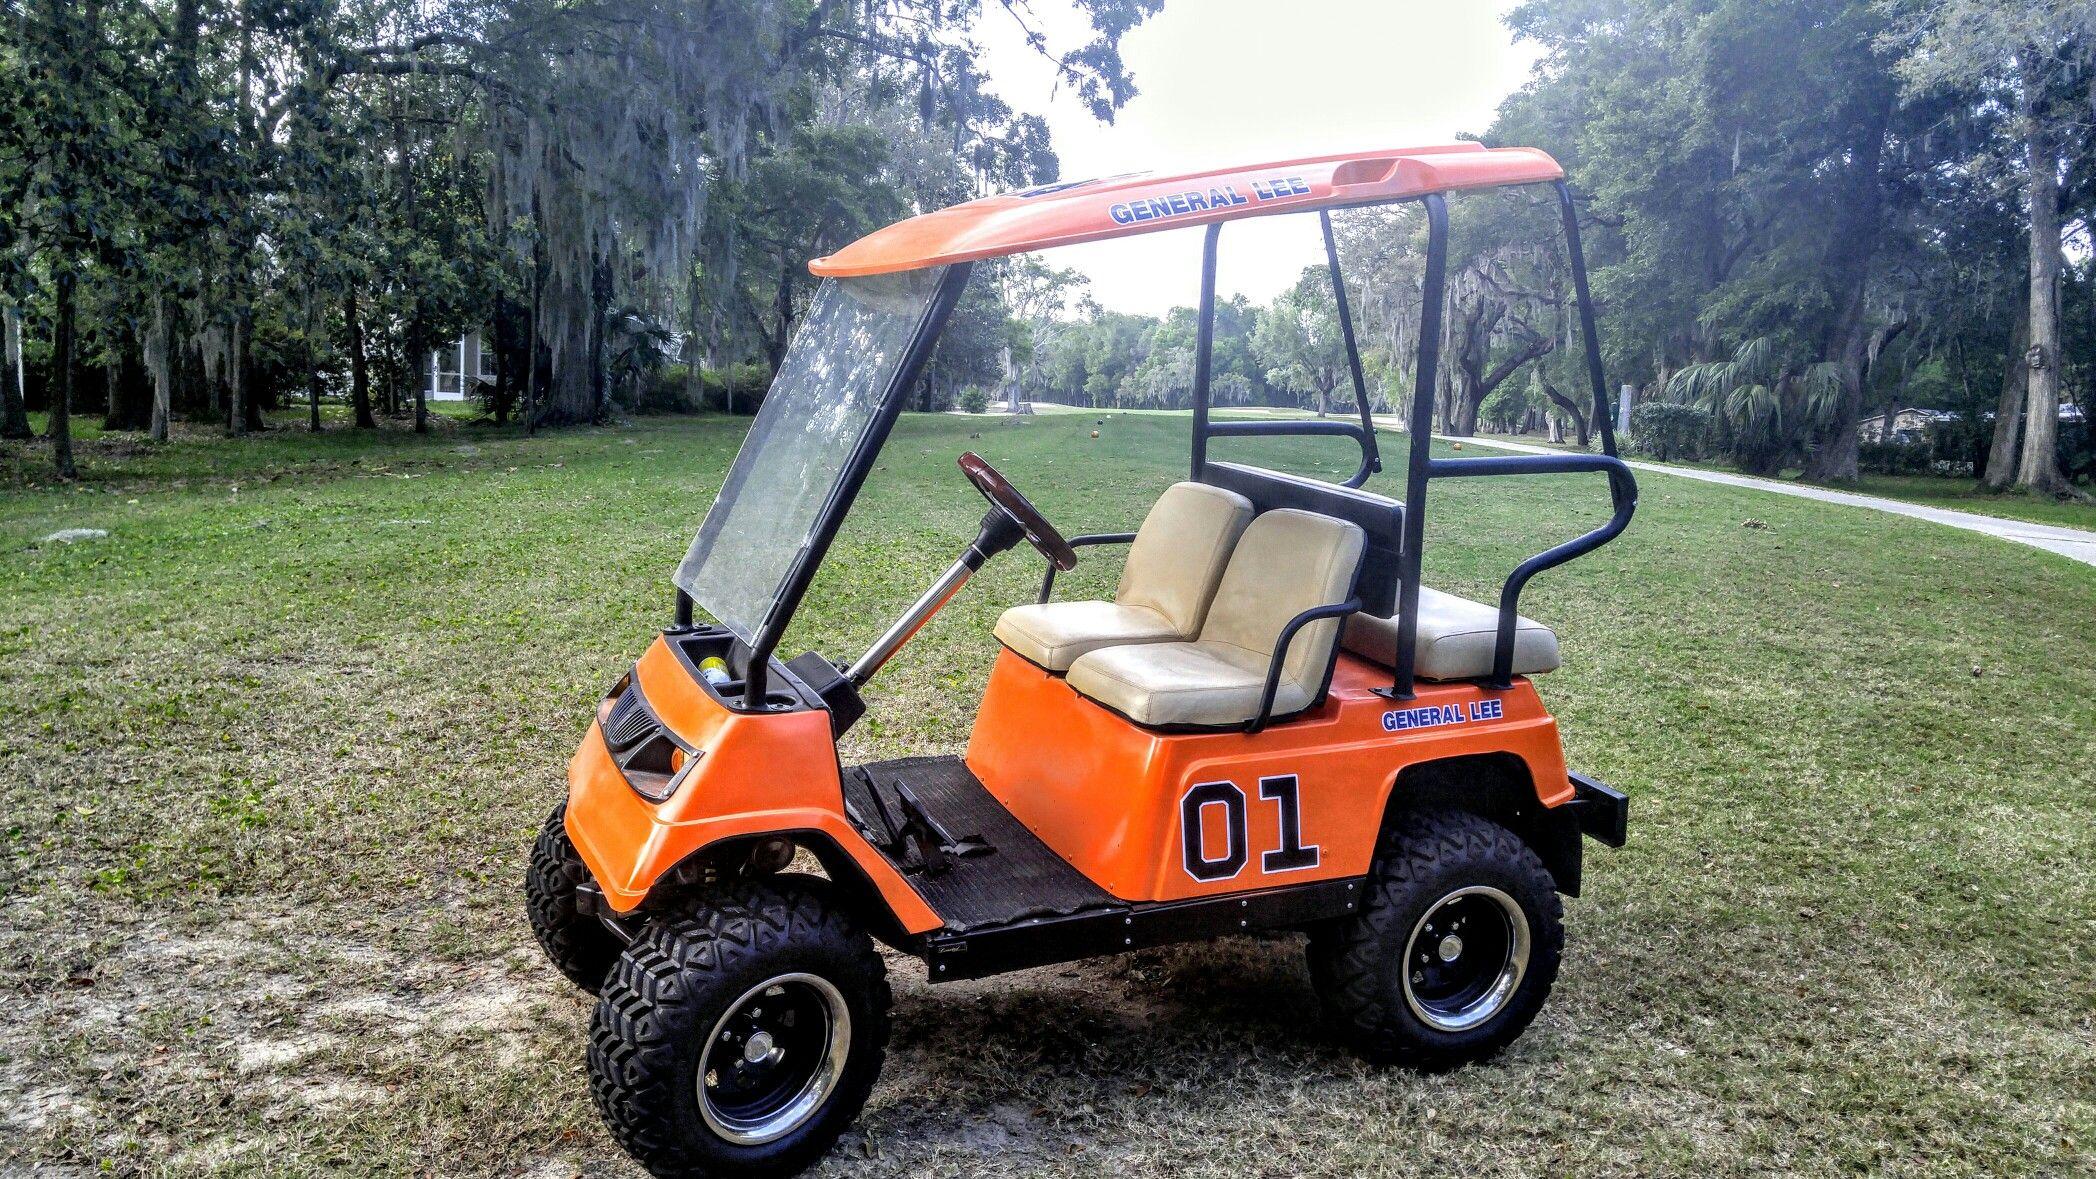 Our 1984 Yamaha G1 turned into the General Lee. 6 inck Jake's lift Yamaha G Golf Cart Push Rod on yamaha golf cart engines, yamaha golf cart bodies, yamaha g9 golf cart, yamaha g8 golf cart, yamaha golf cart serial number, yamaha g18 golf cart, yamaha golf cart body kit, yamaha g20 golf cart, yamaha golf cart covers, yamaha g4 golf cart, identify yamaha golf cart, yamaha golf cart accessories, 1970 yamaha golf cart, yamaha golf cart seat replacements, yamaha golf cart 6 inch lift, yamaha golf cart wiring diagram, yamaha g22 golf cart, 08 yamaha golf cart, stereo for yamaha golf cart, lifted g1 golf cart,